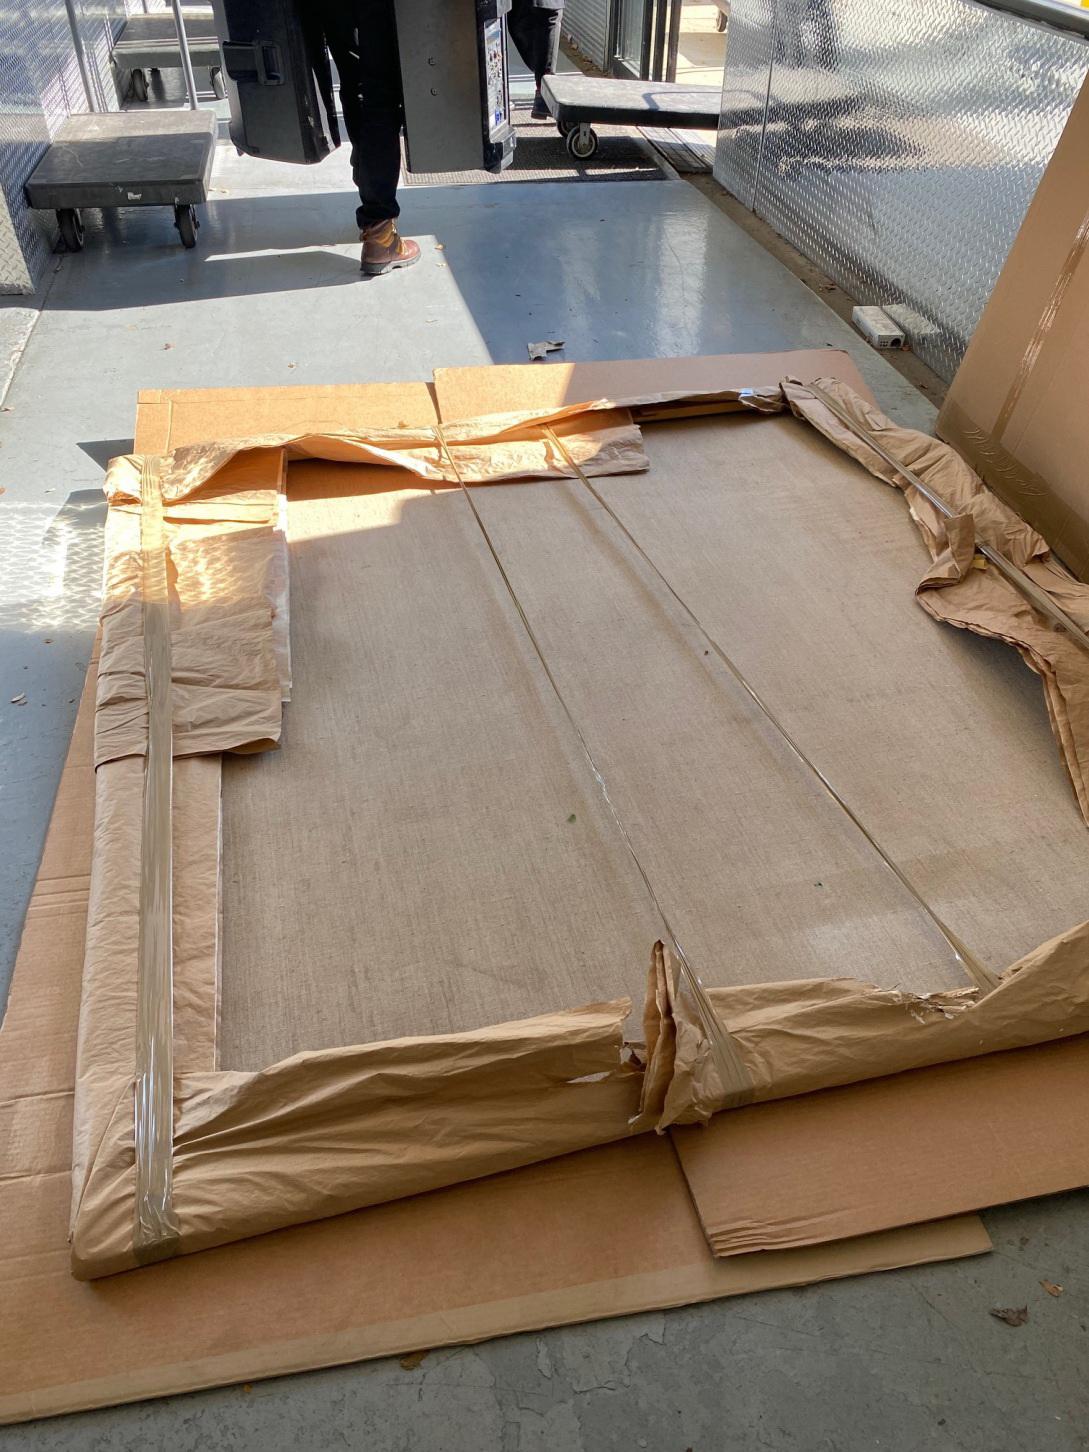 Shipping oversized art